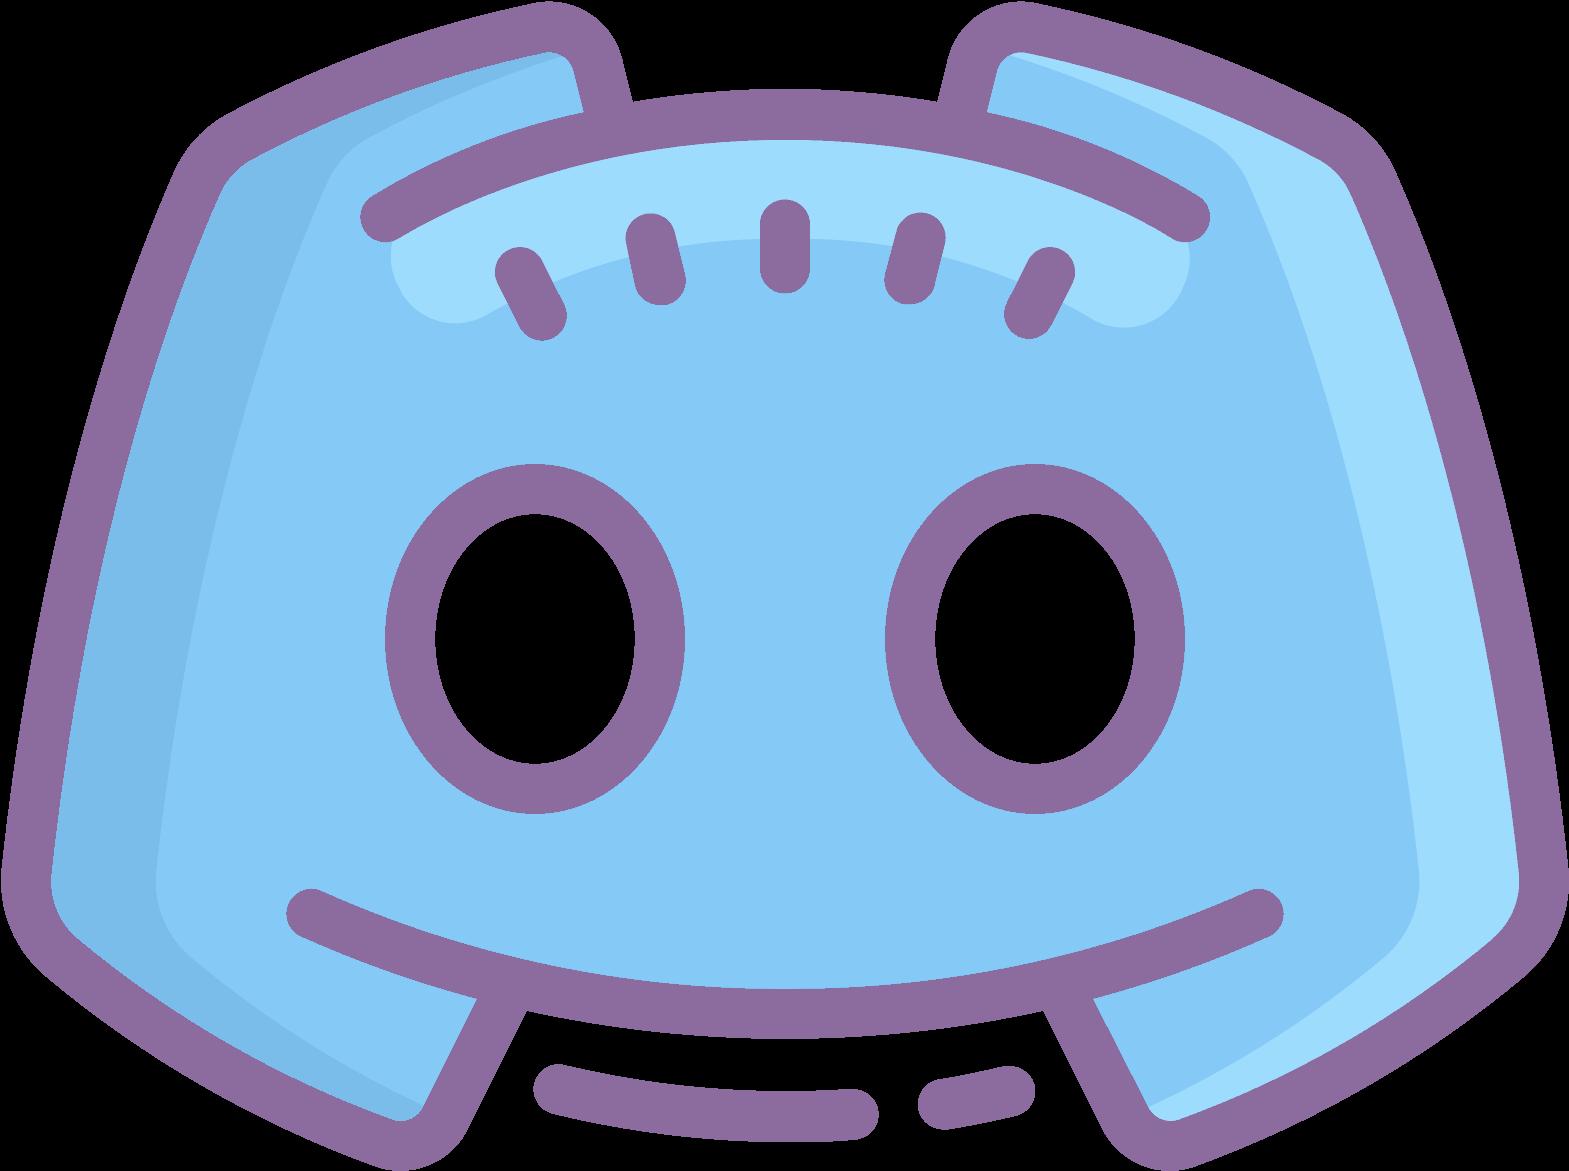 Network Discord Icons Computer Graphics Logo Emoji - Christmas